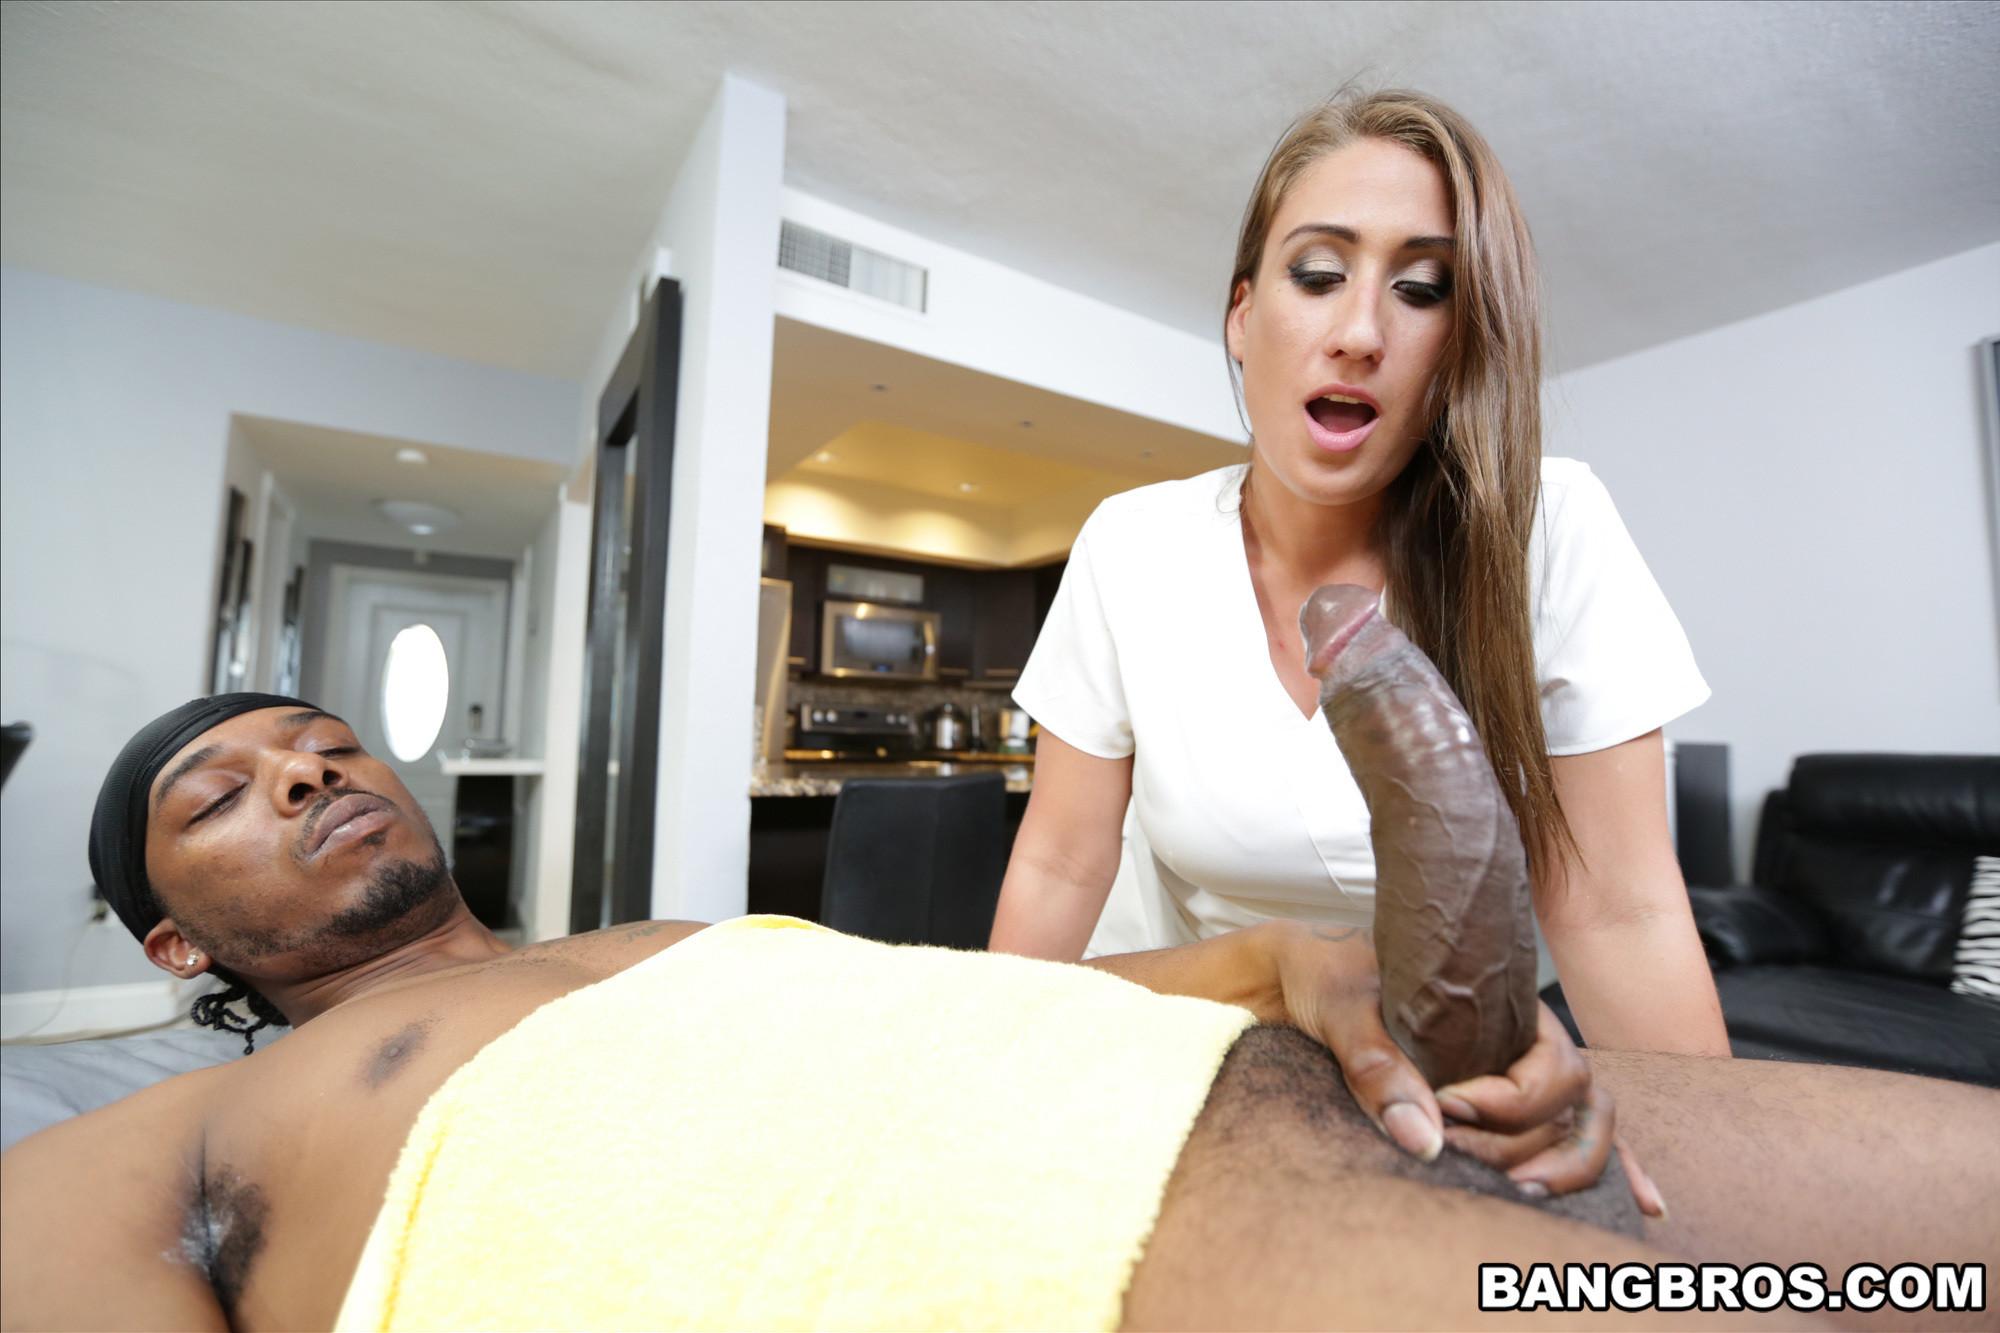 Skyler Luv - Массаж - Порно галерея № 3468623